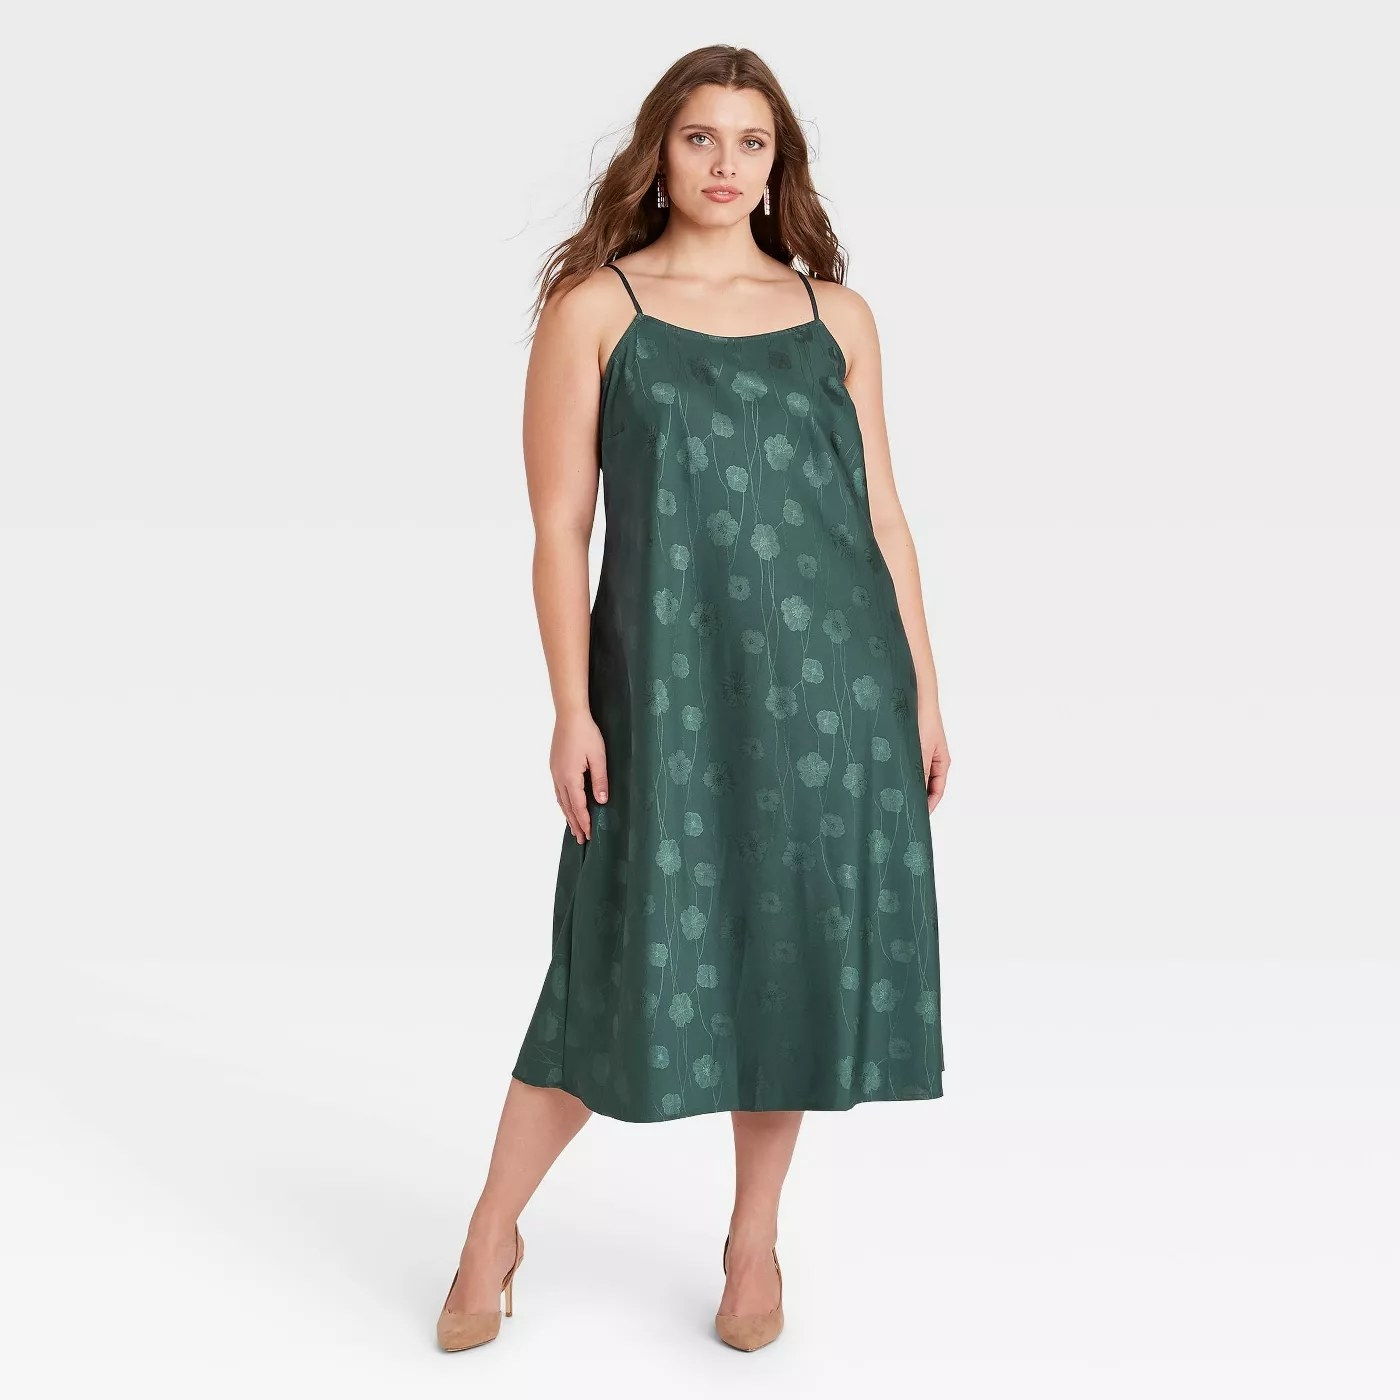 a model wears an emerald green slip dress